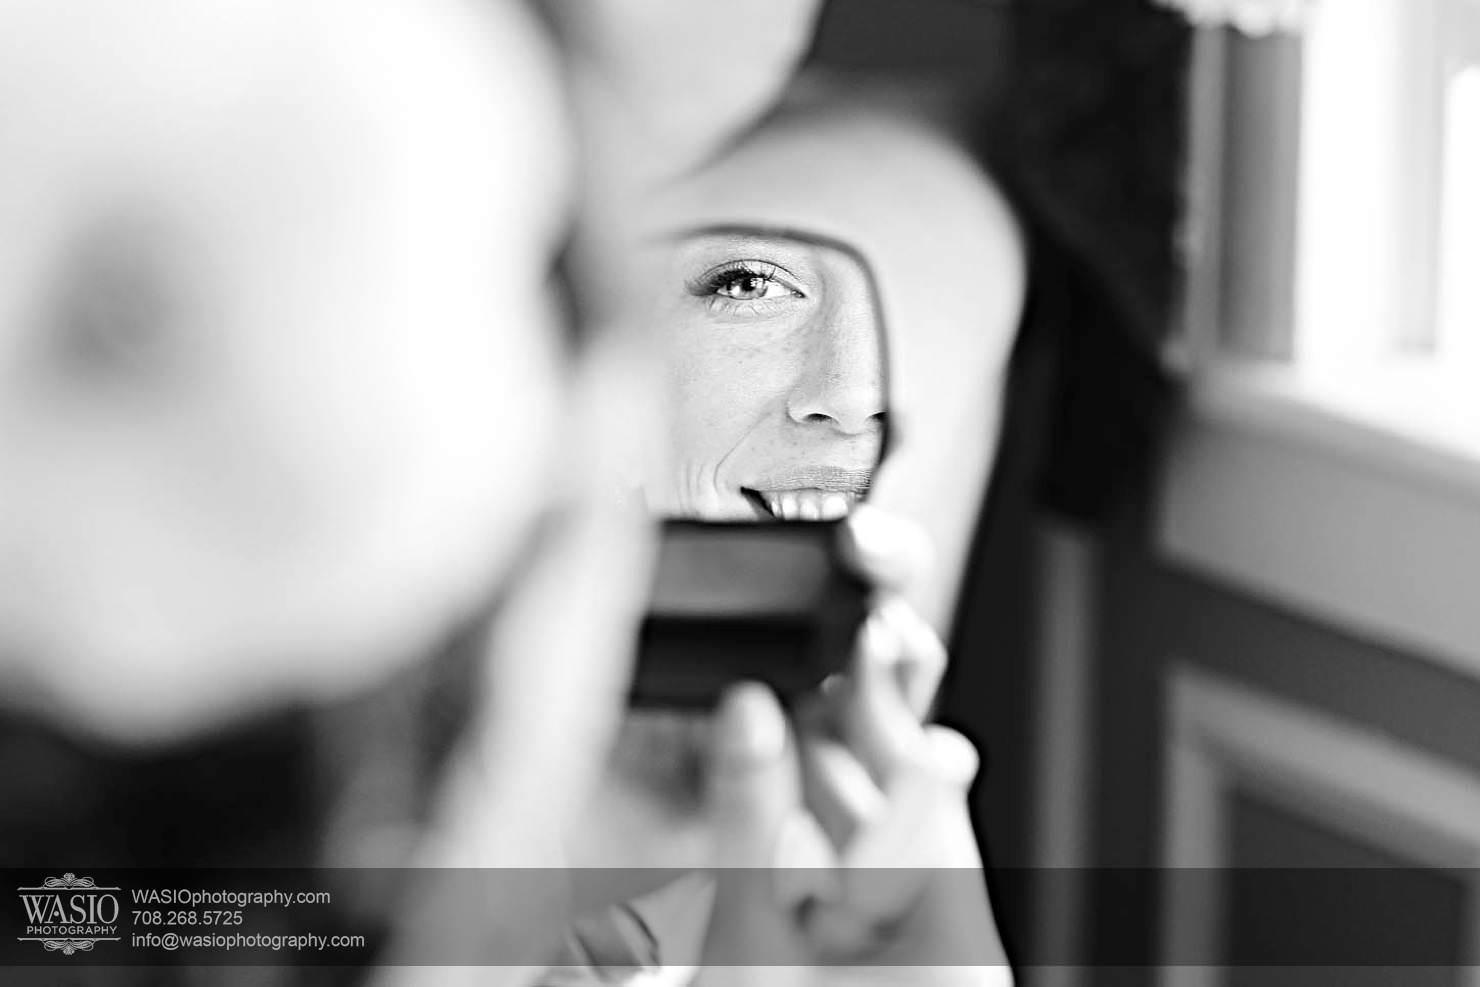 bride-preparation-portrait-mirror-reflection Chevy Chase Country Club Wedding - Elizabeth & Michael